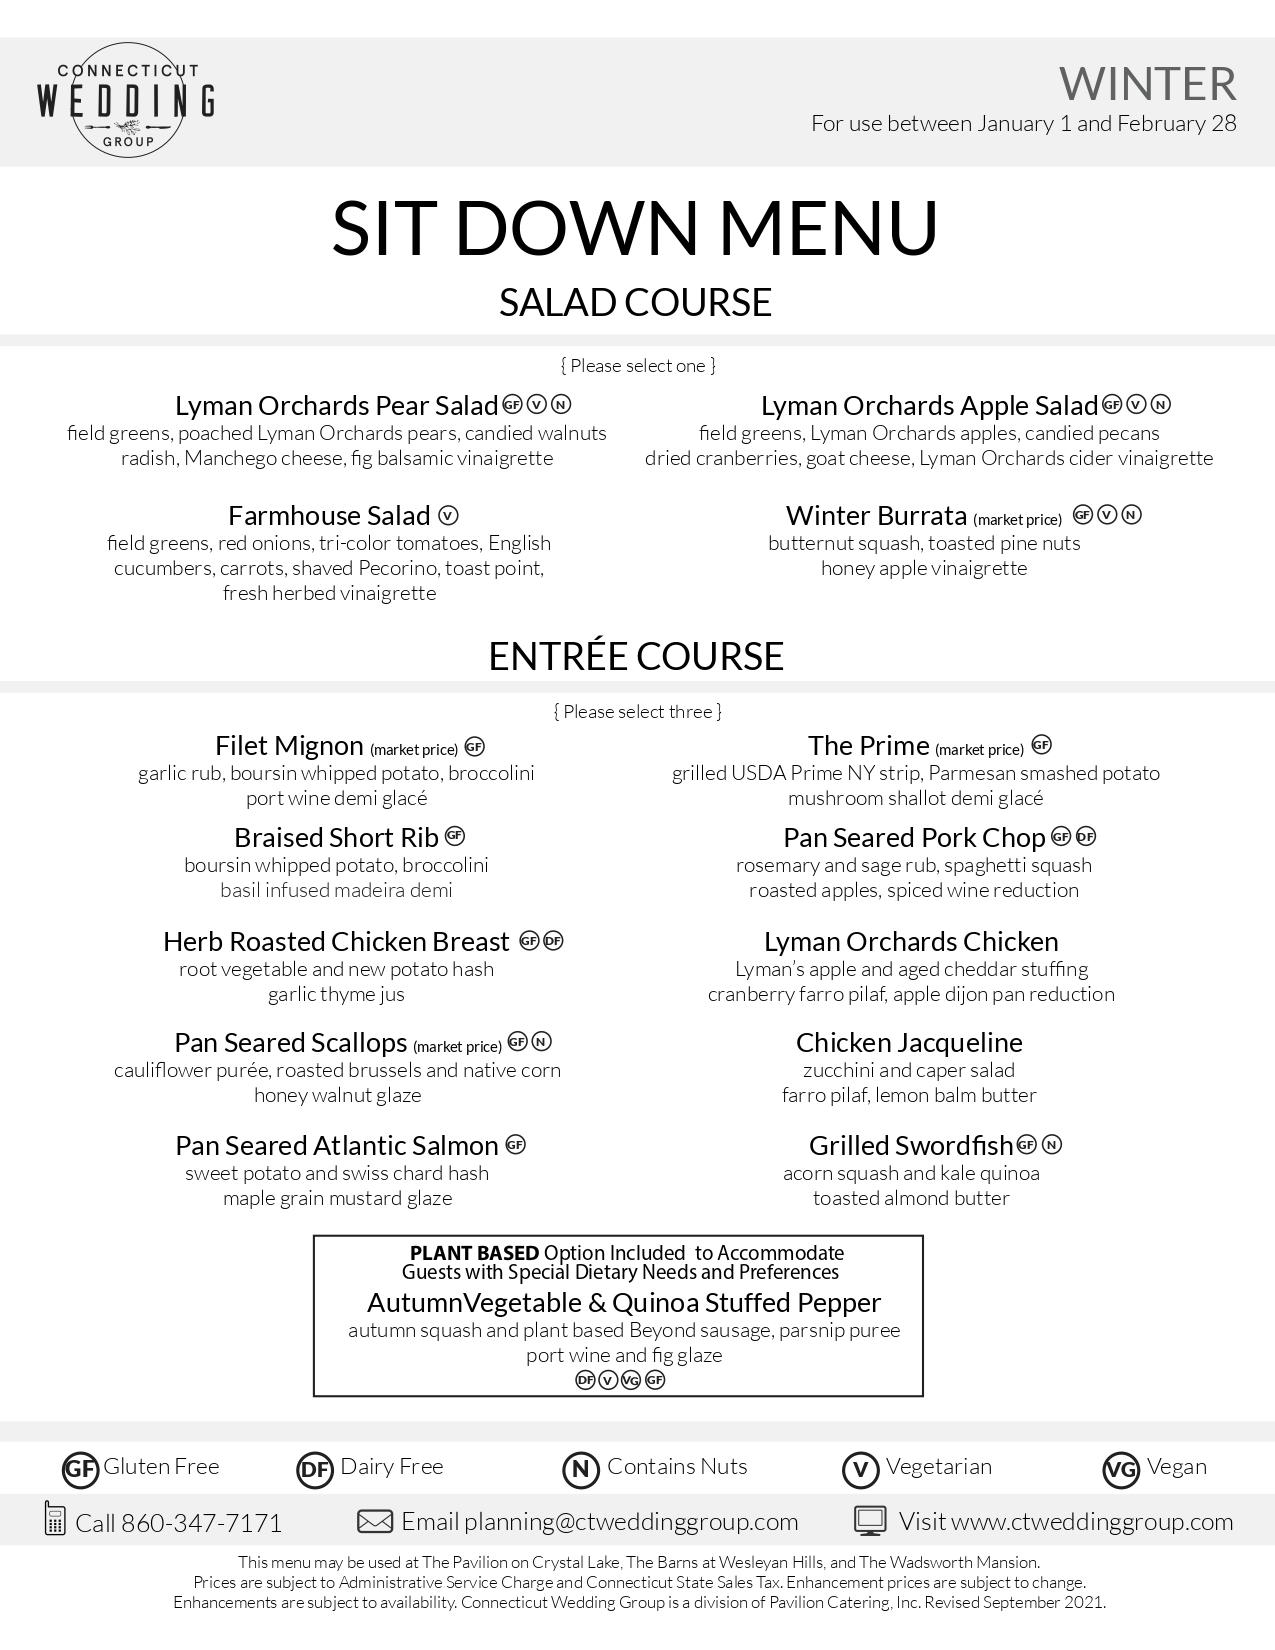 Winter-Sit-Down-Buffet-Menu-2022_NEW_page-0001